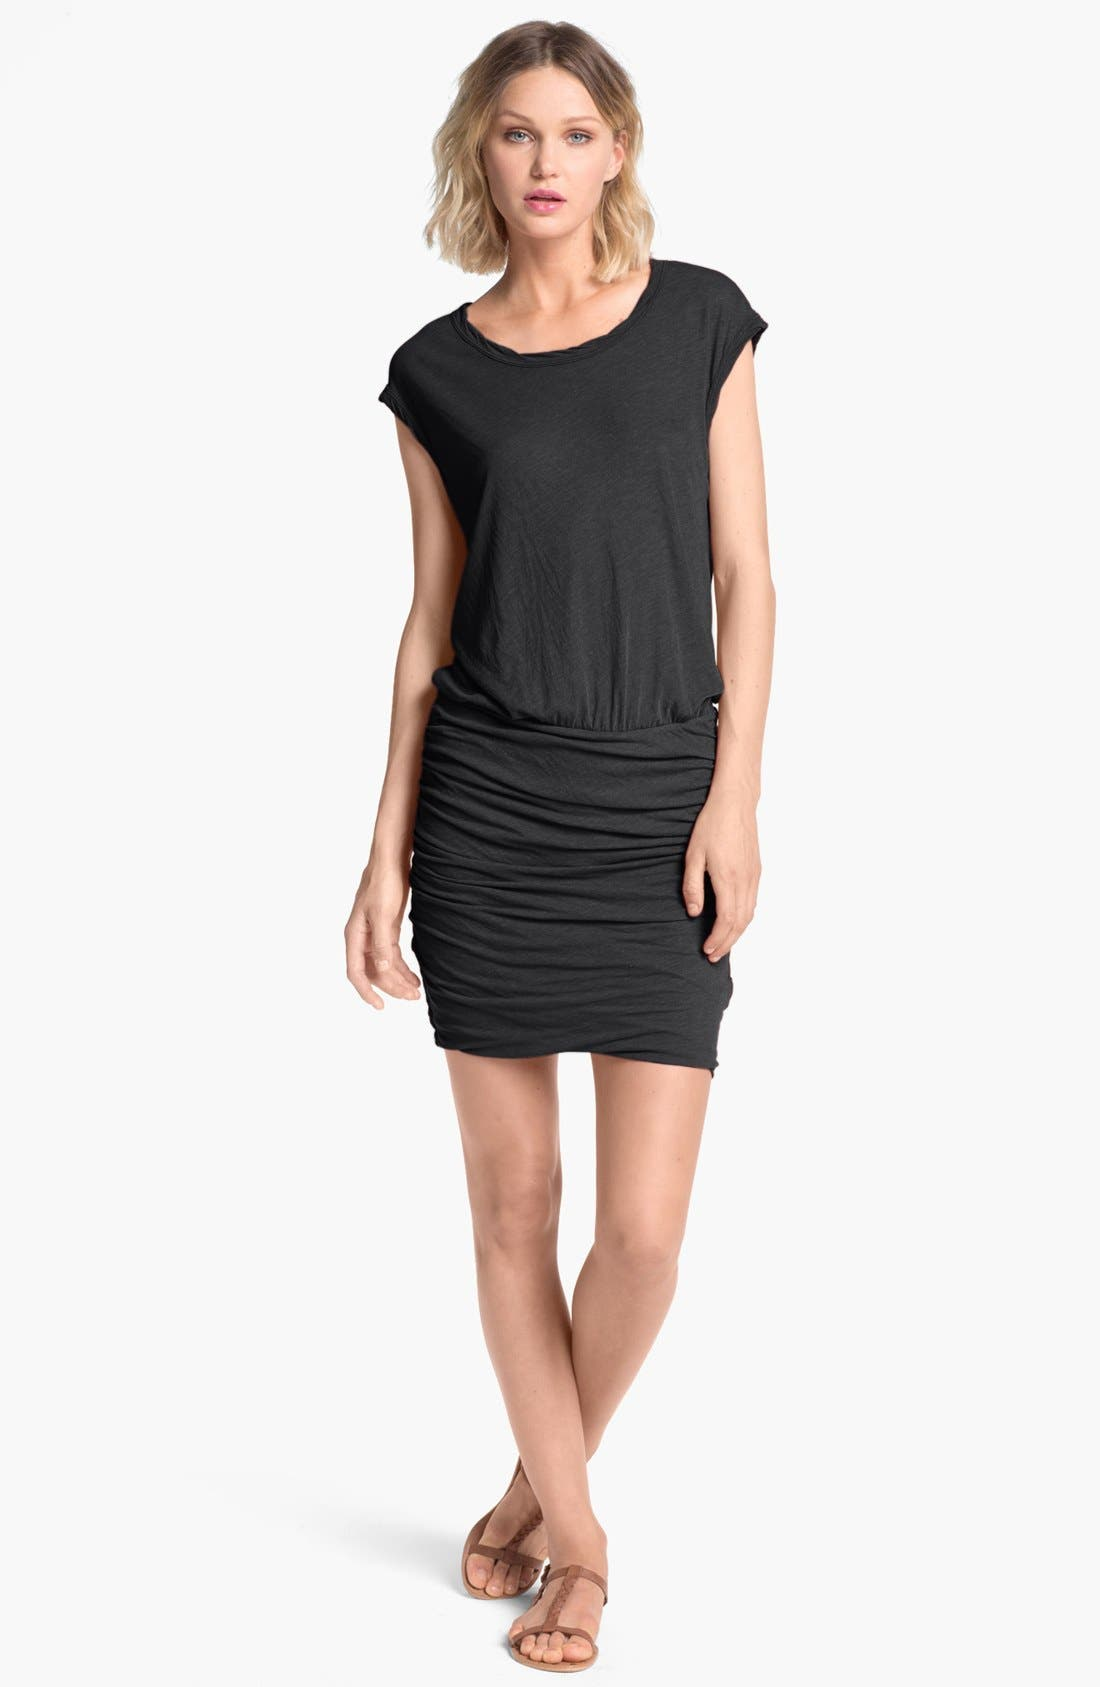 Main Image - James Perse 'High Twist' Jersey Dress